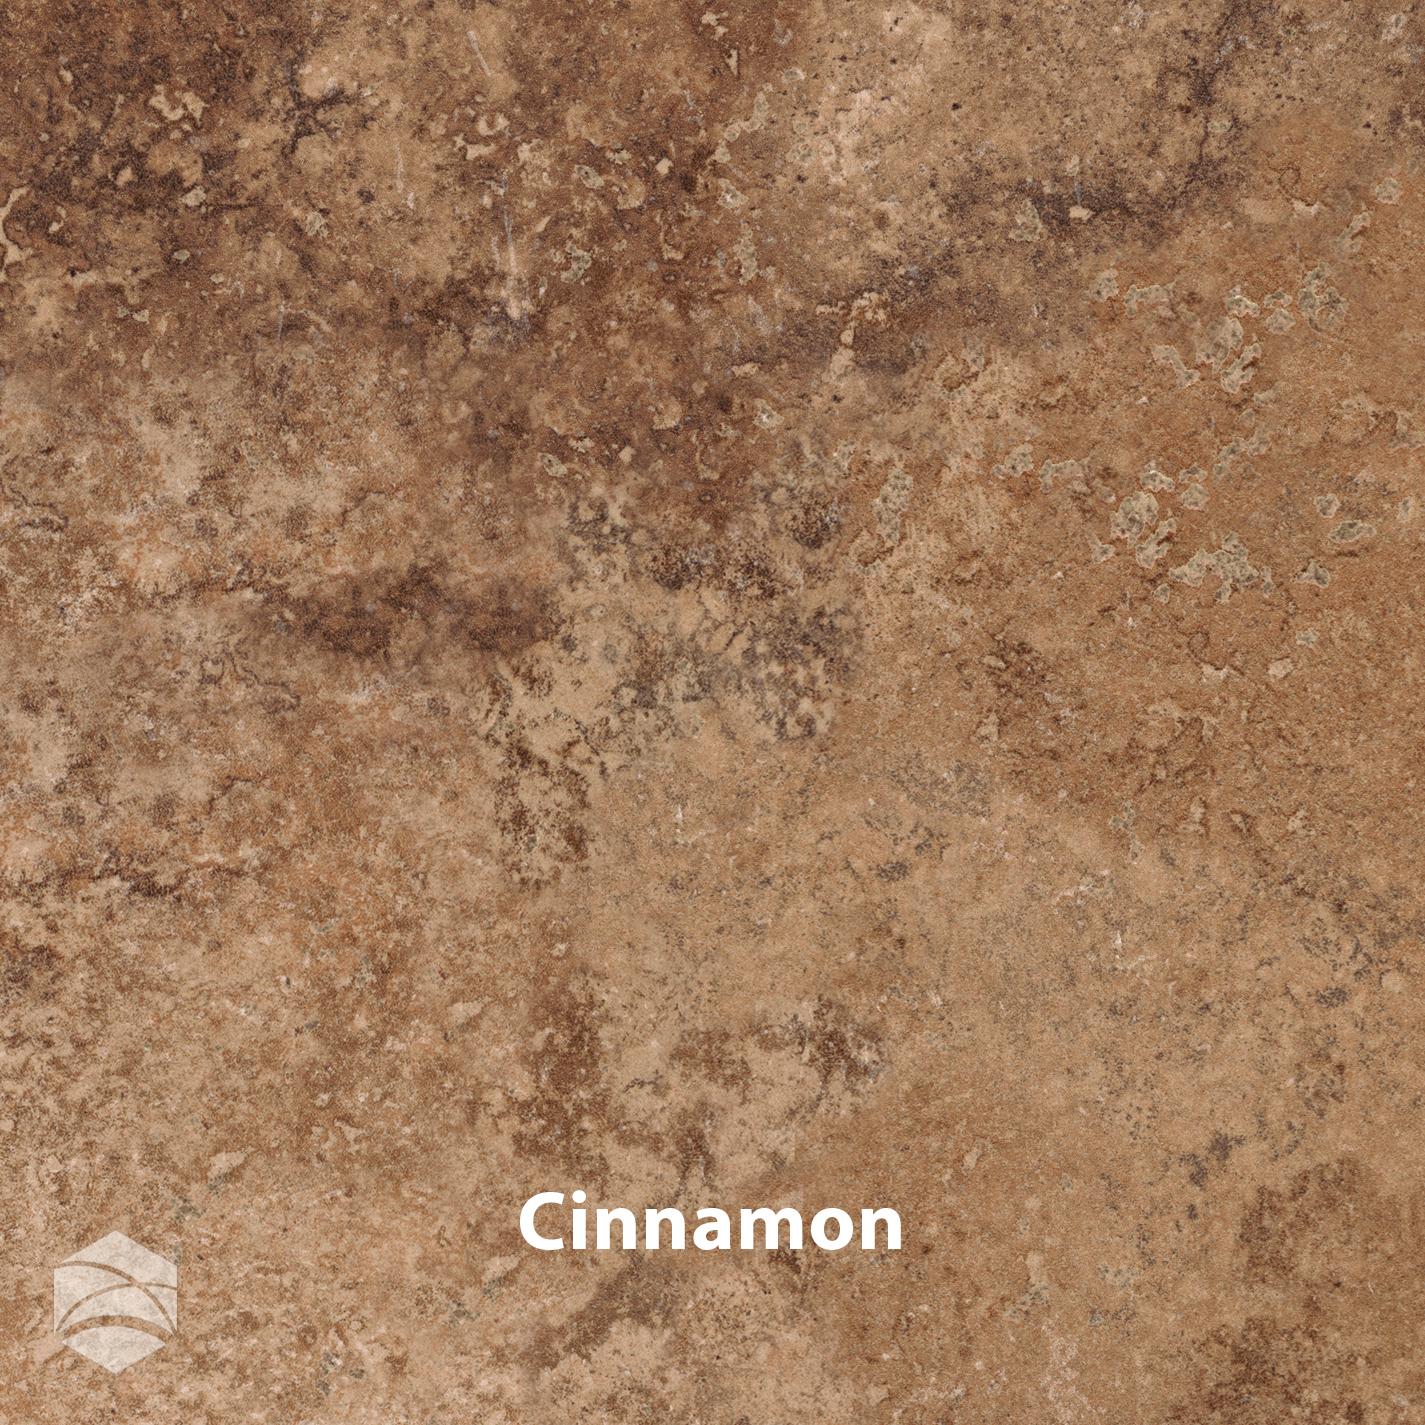 Cinnamon_V2_14x14.jpg